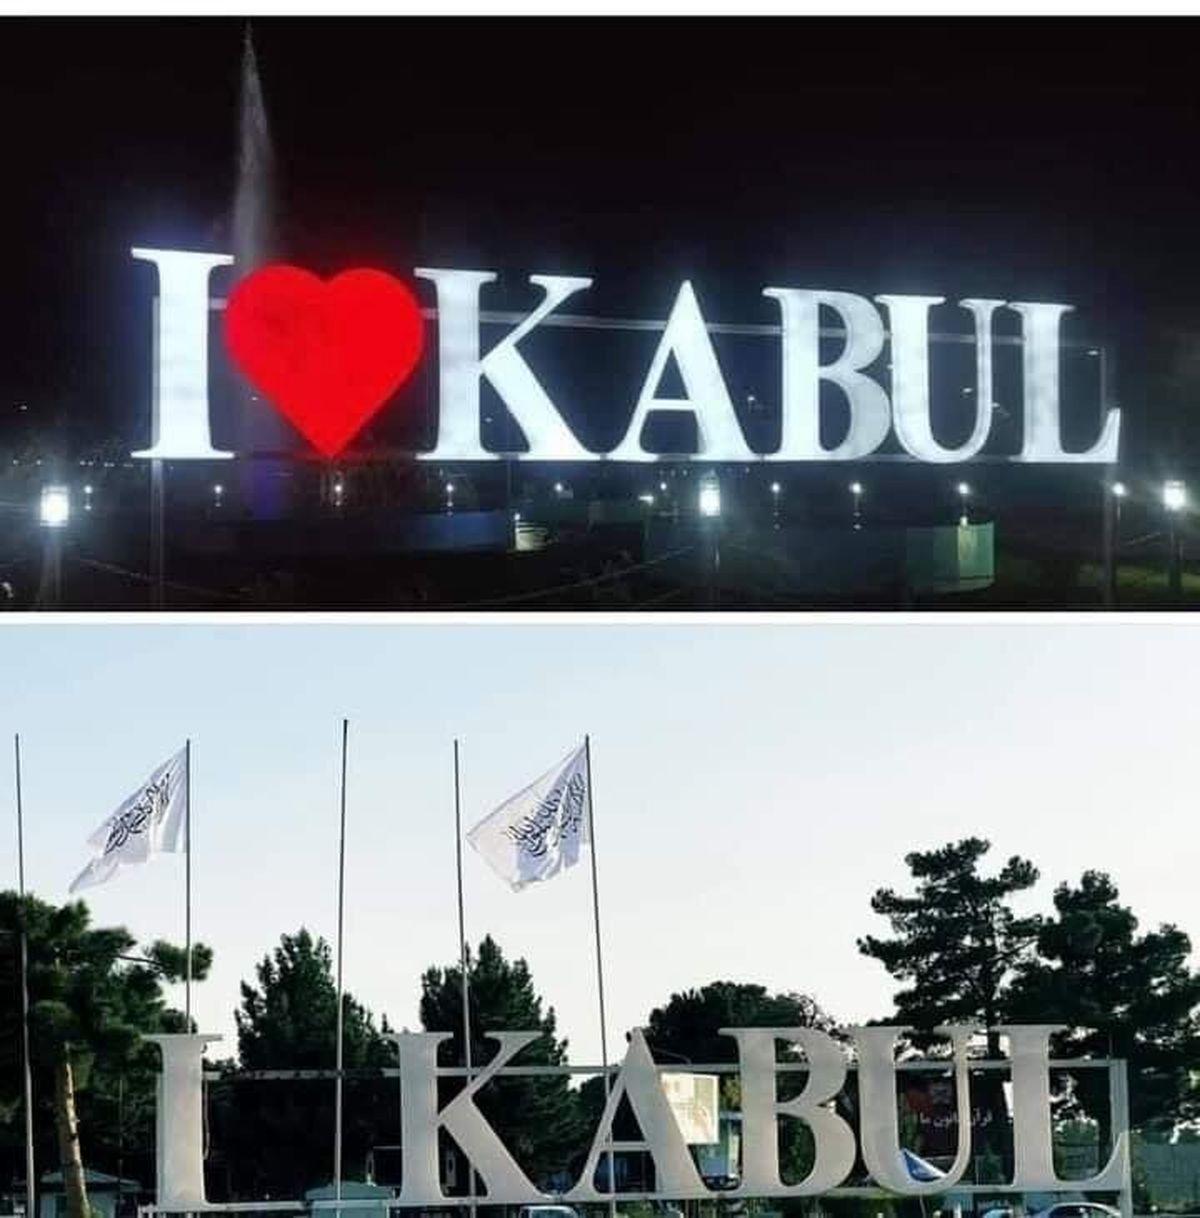 تصویر حذف عجیب قلب کابل توسط طالبان